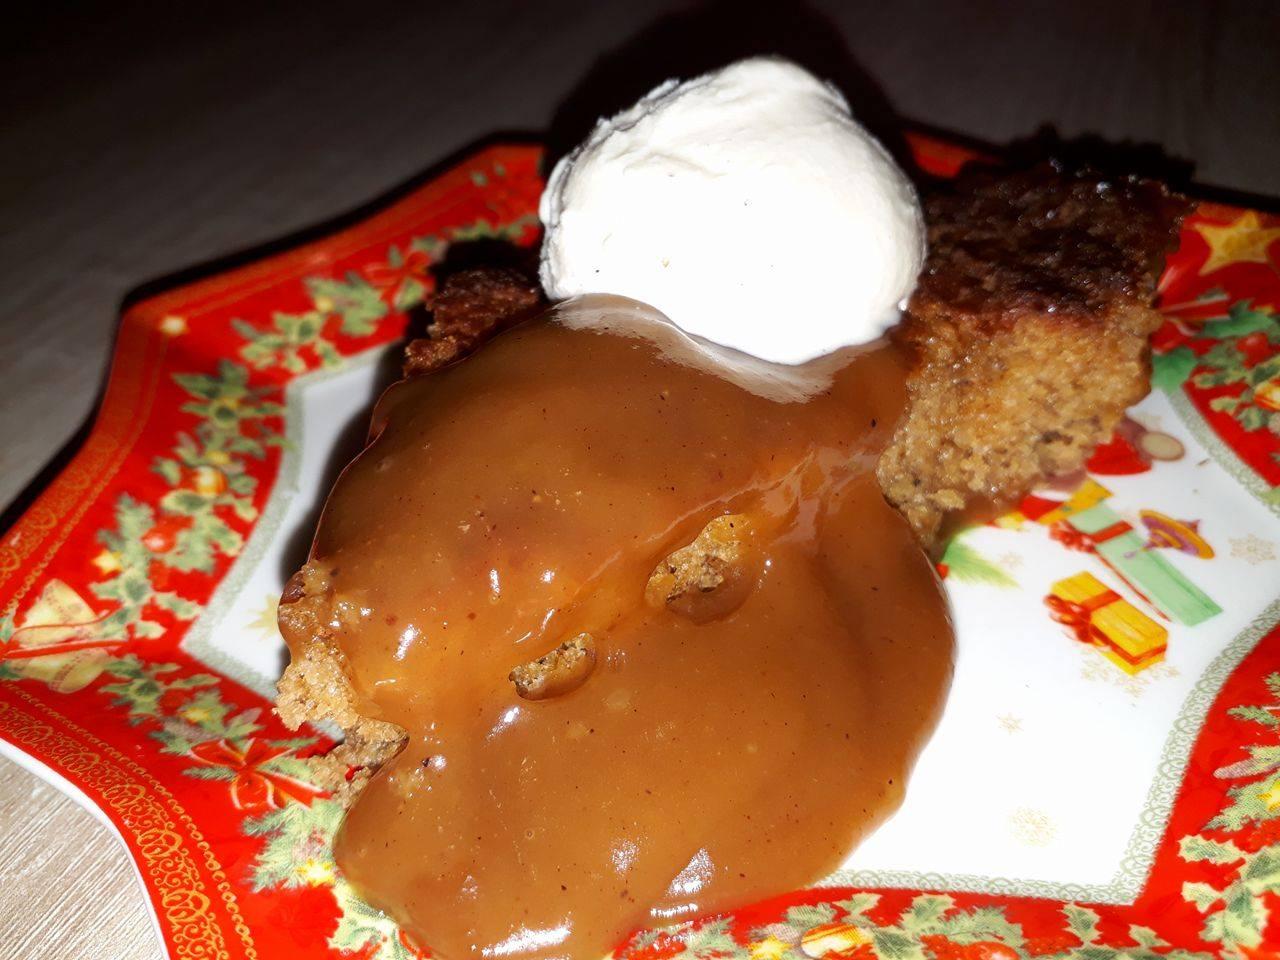 Holiday Hot Cake (Nigella Lawson's Recipe)